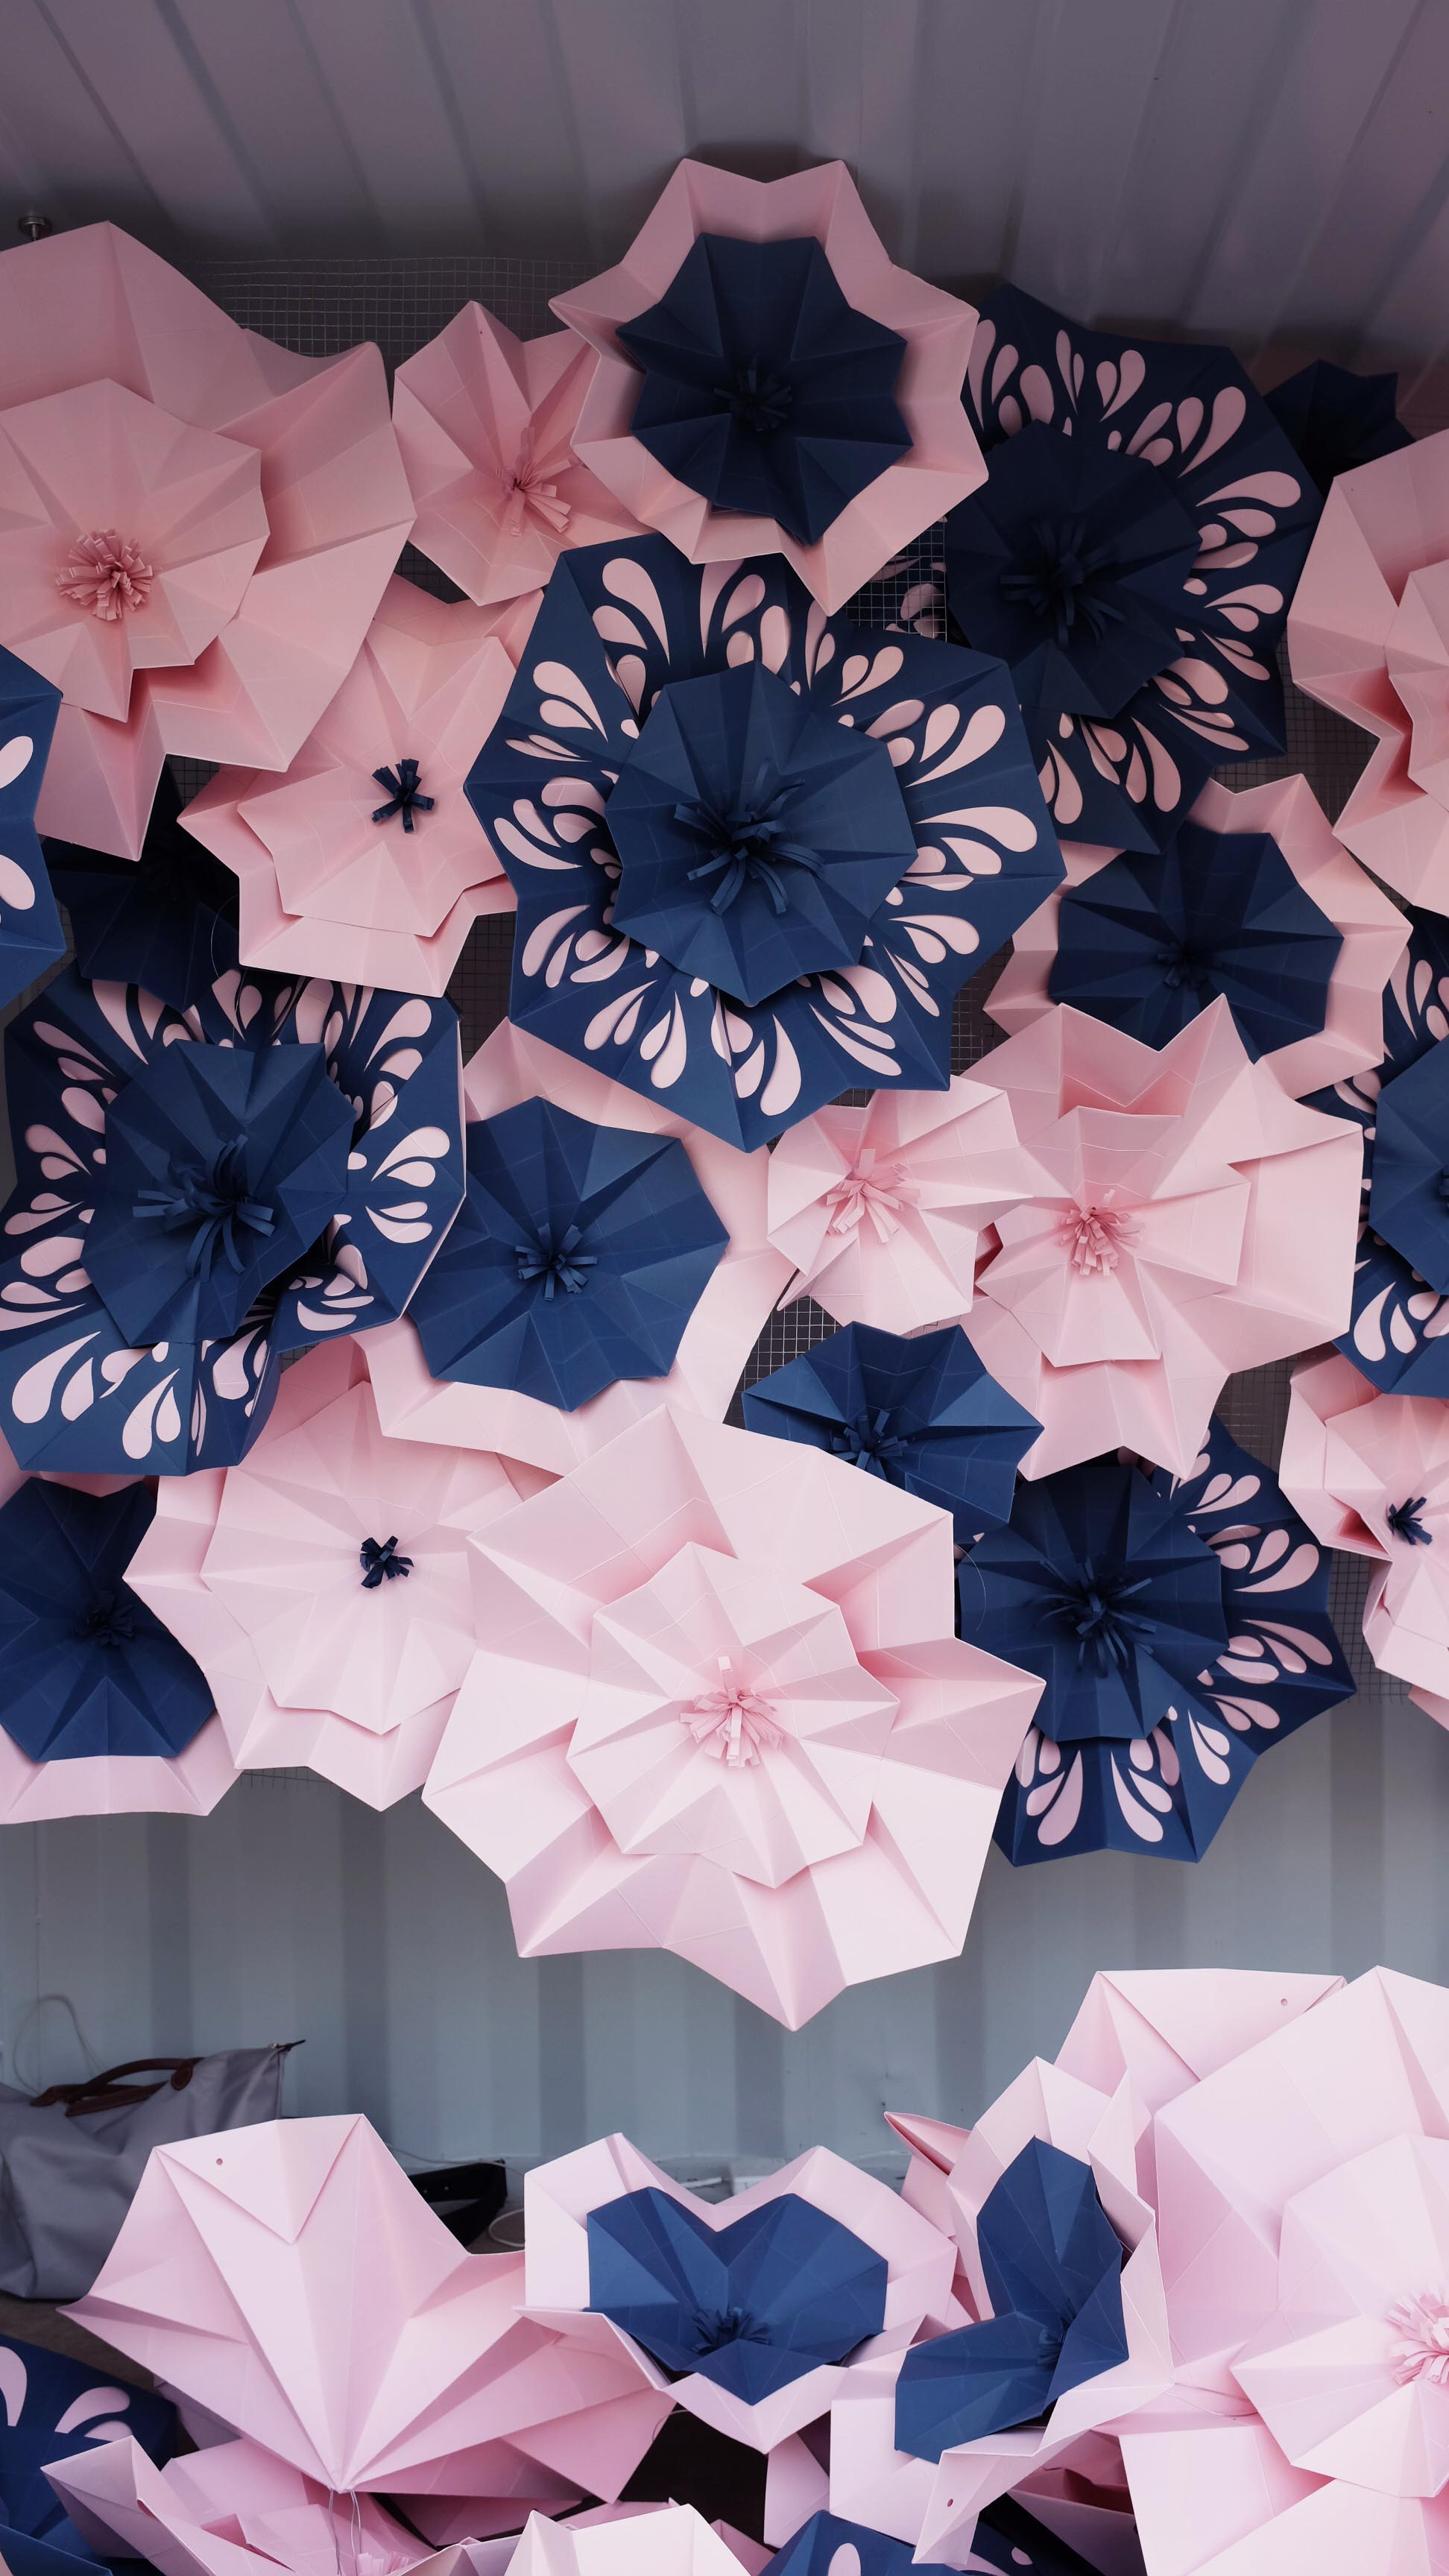 miss-cloudy-pauline-loctin-wonderbra-paper-flower-art-origami-fold-installation-5.jpeg